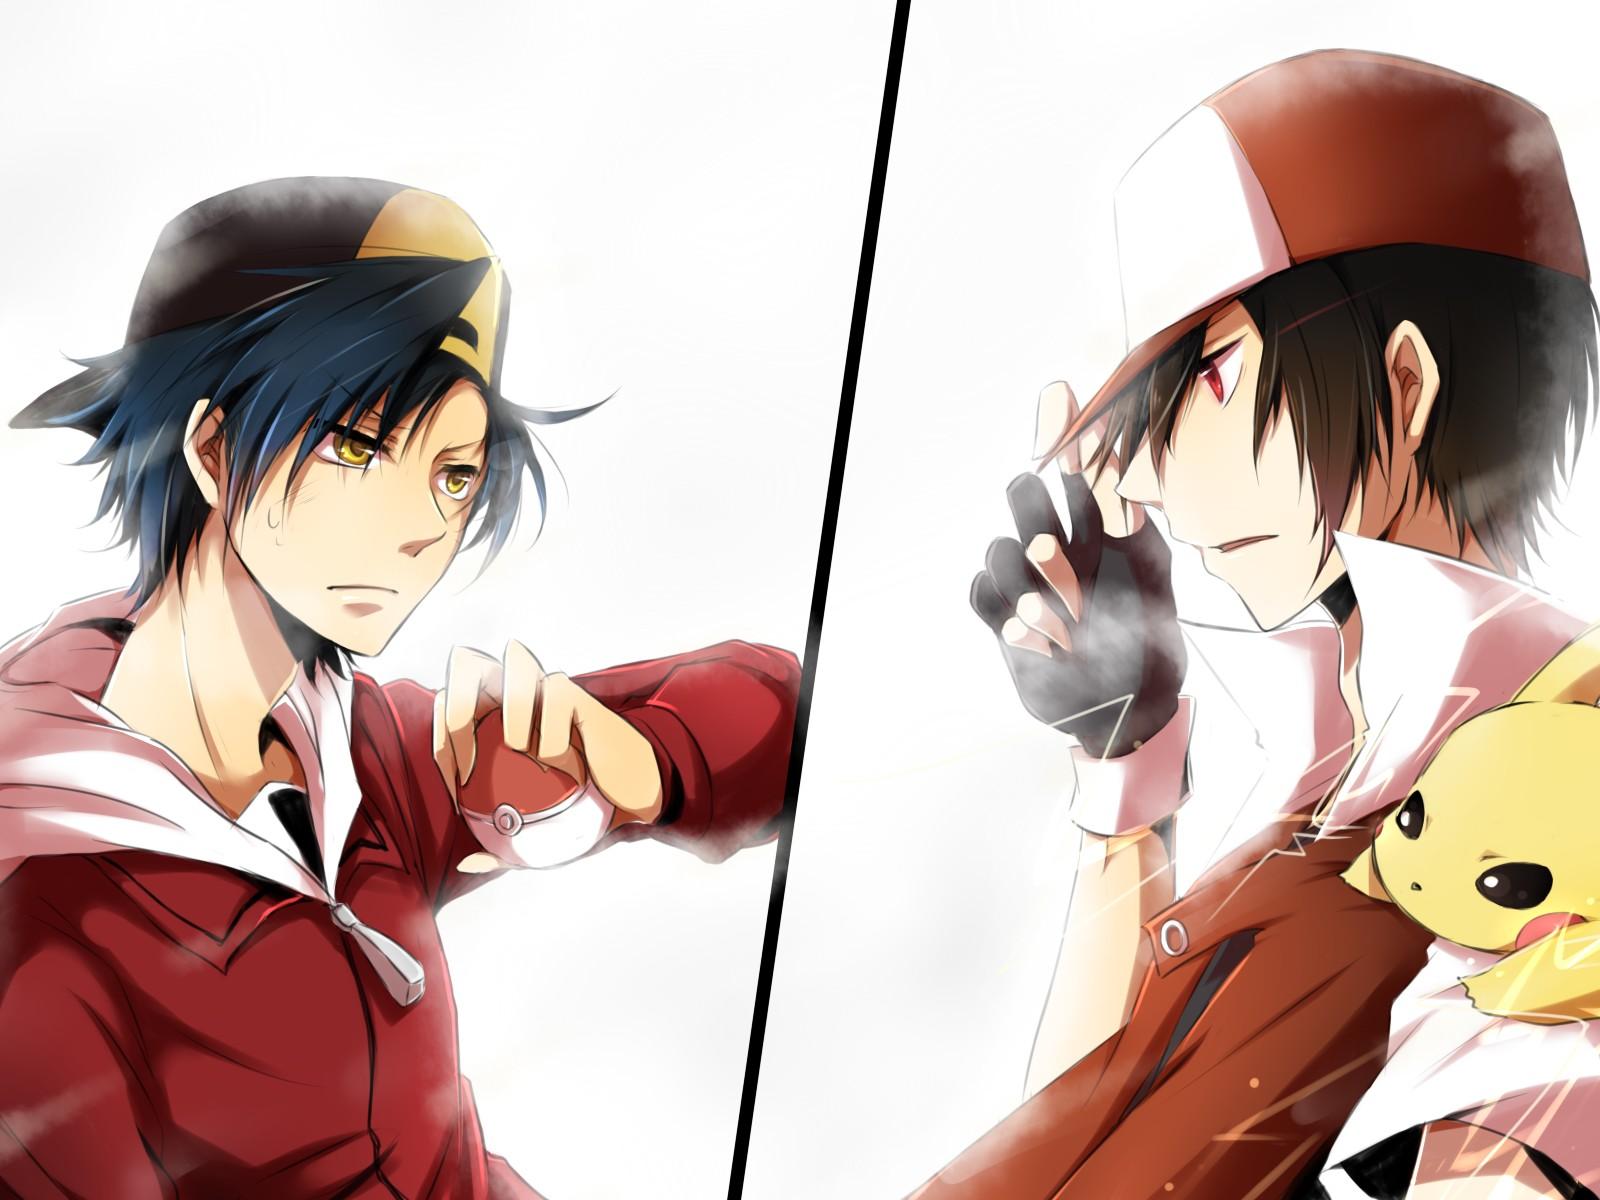 pokemon pokemon heartgold and soulsilver nintendo pikachu red pokemon 1600x1200